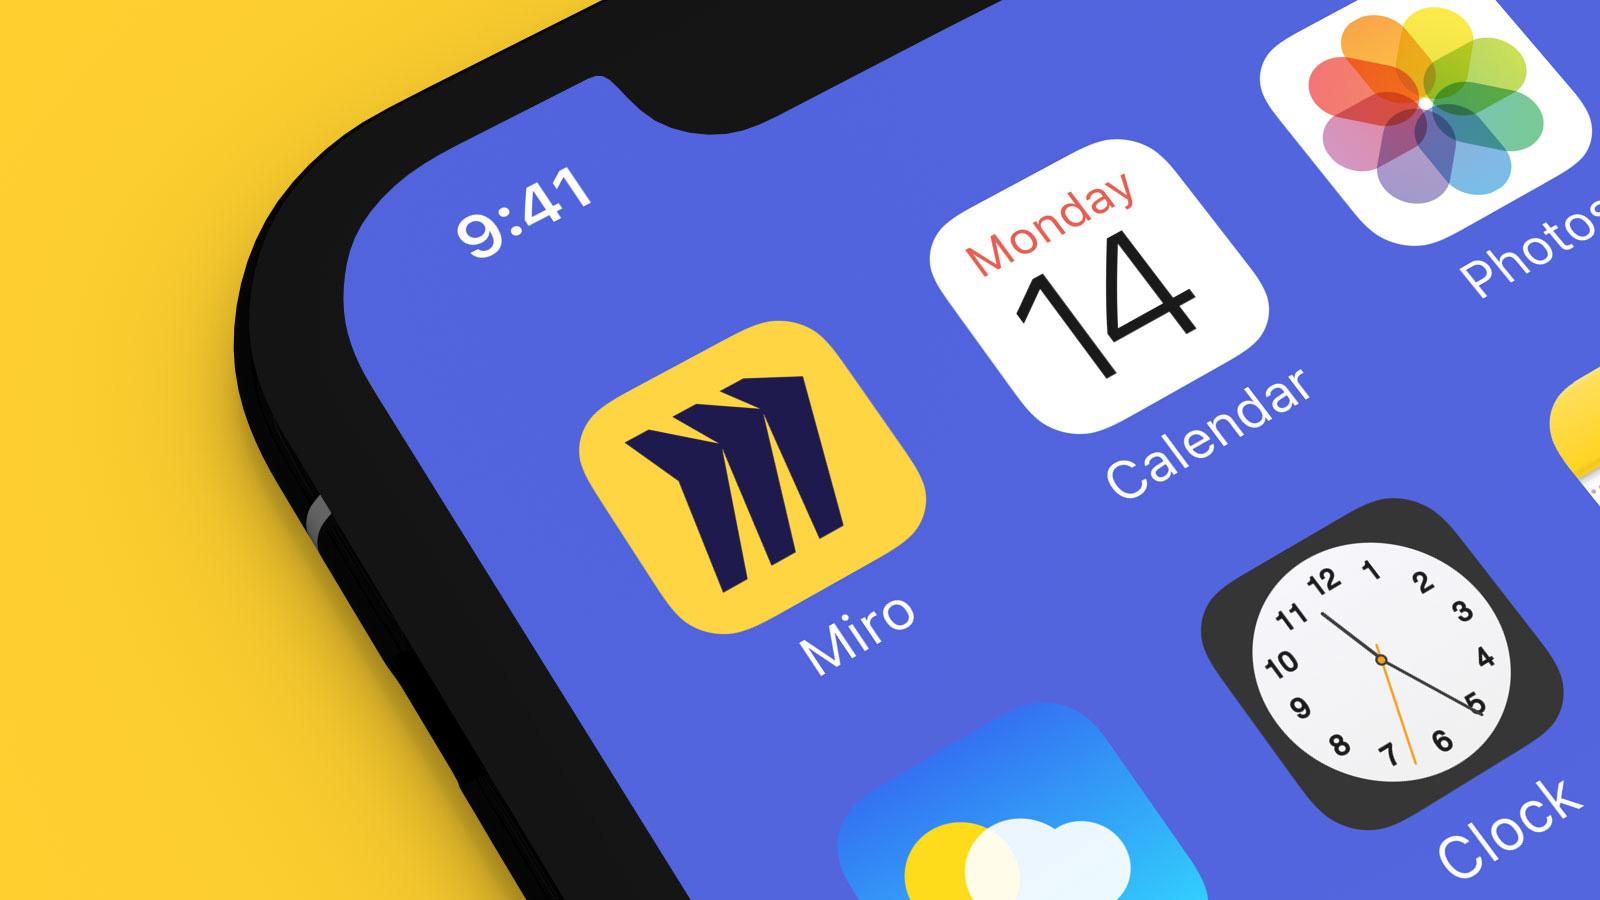 RealtimeBoard更名miro并启用全新的品牌logo和vi形象设计-深圳vi设计10